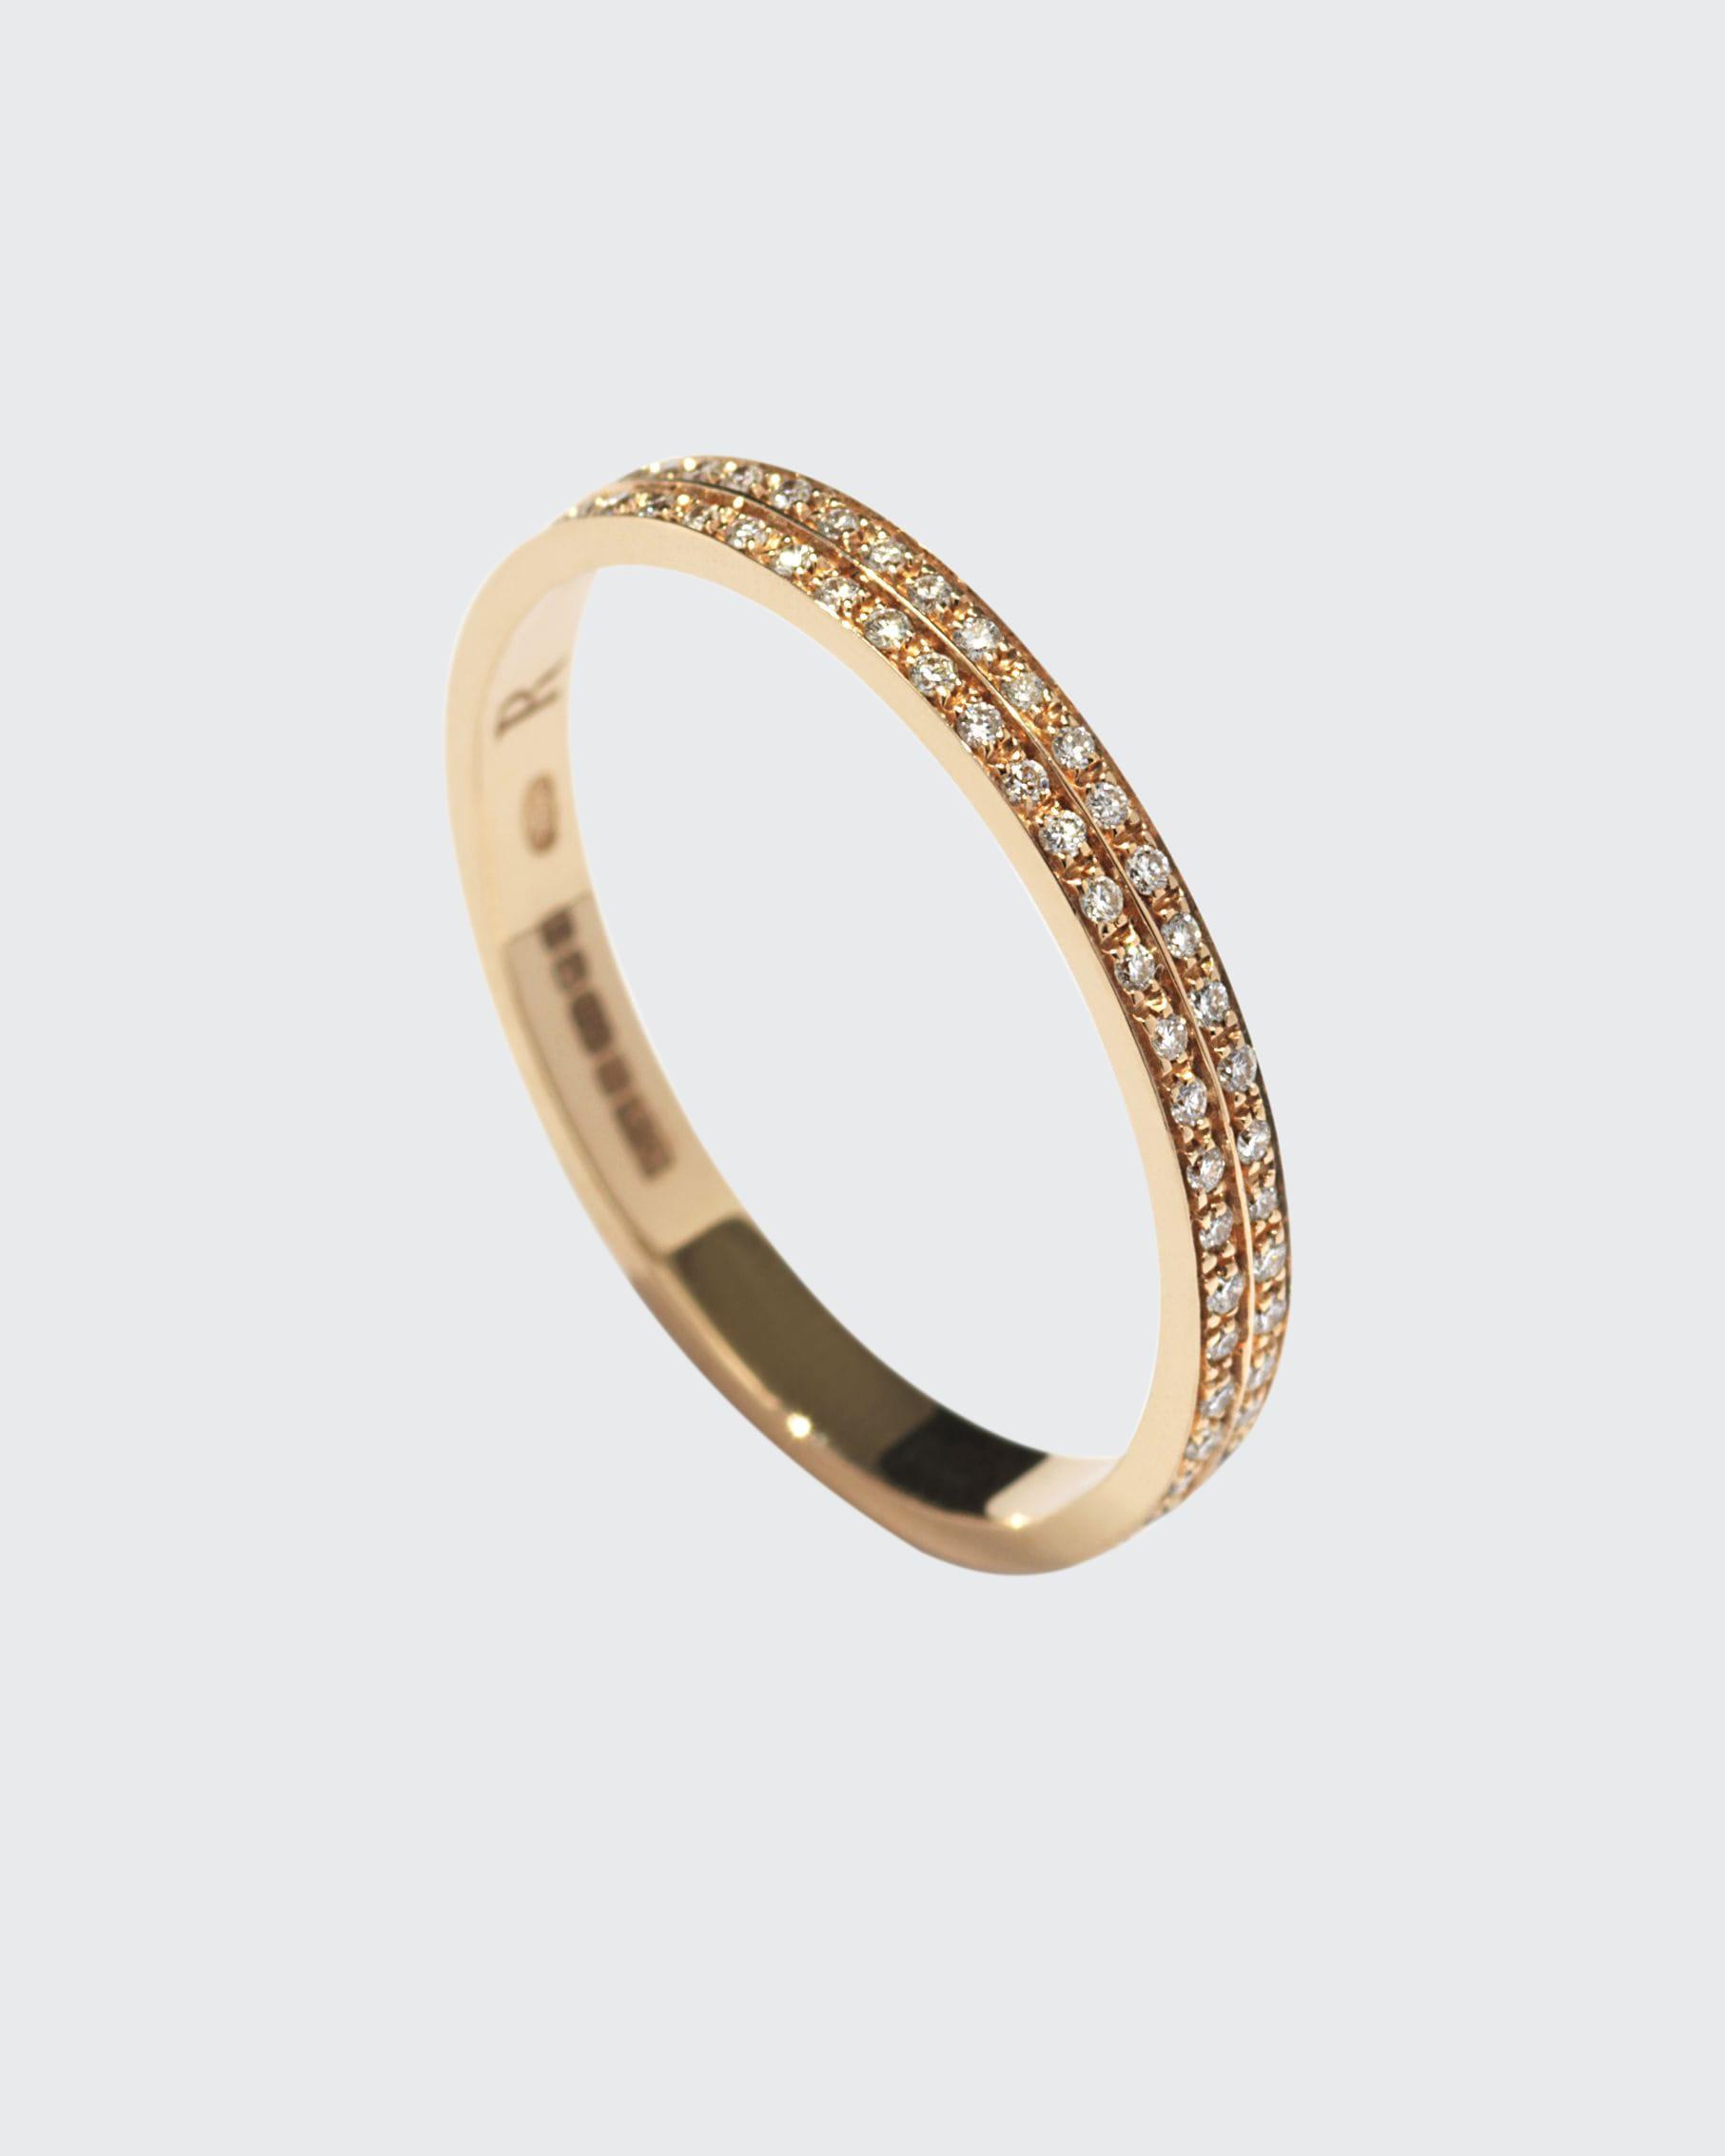 Repossi BERBERE DIAMOND BAND RING IN 18K GOLD